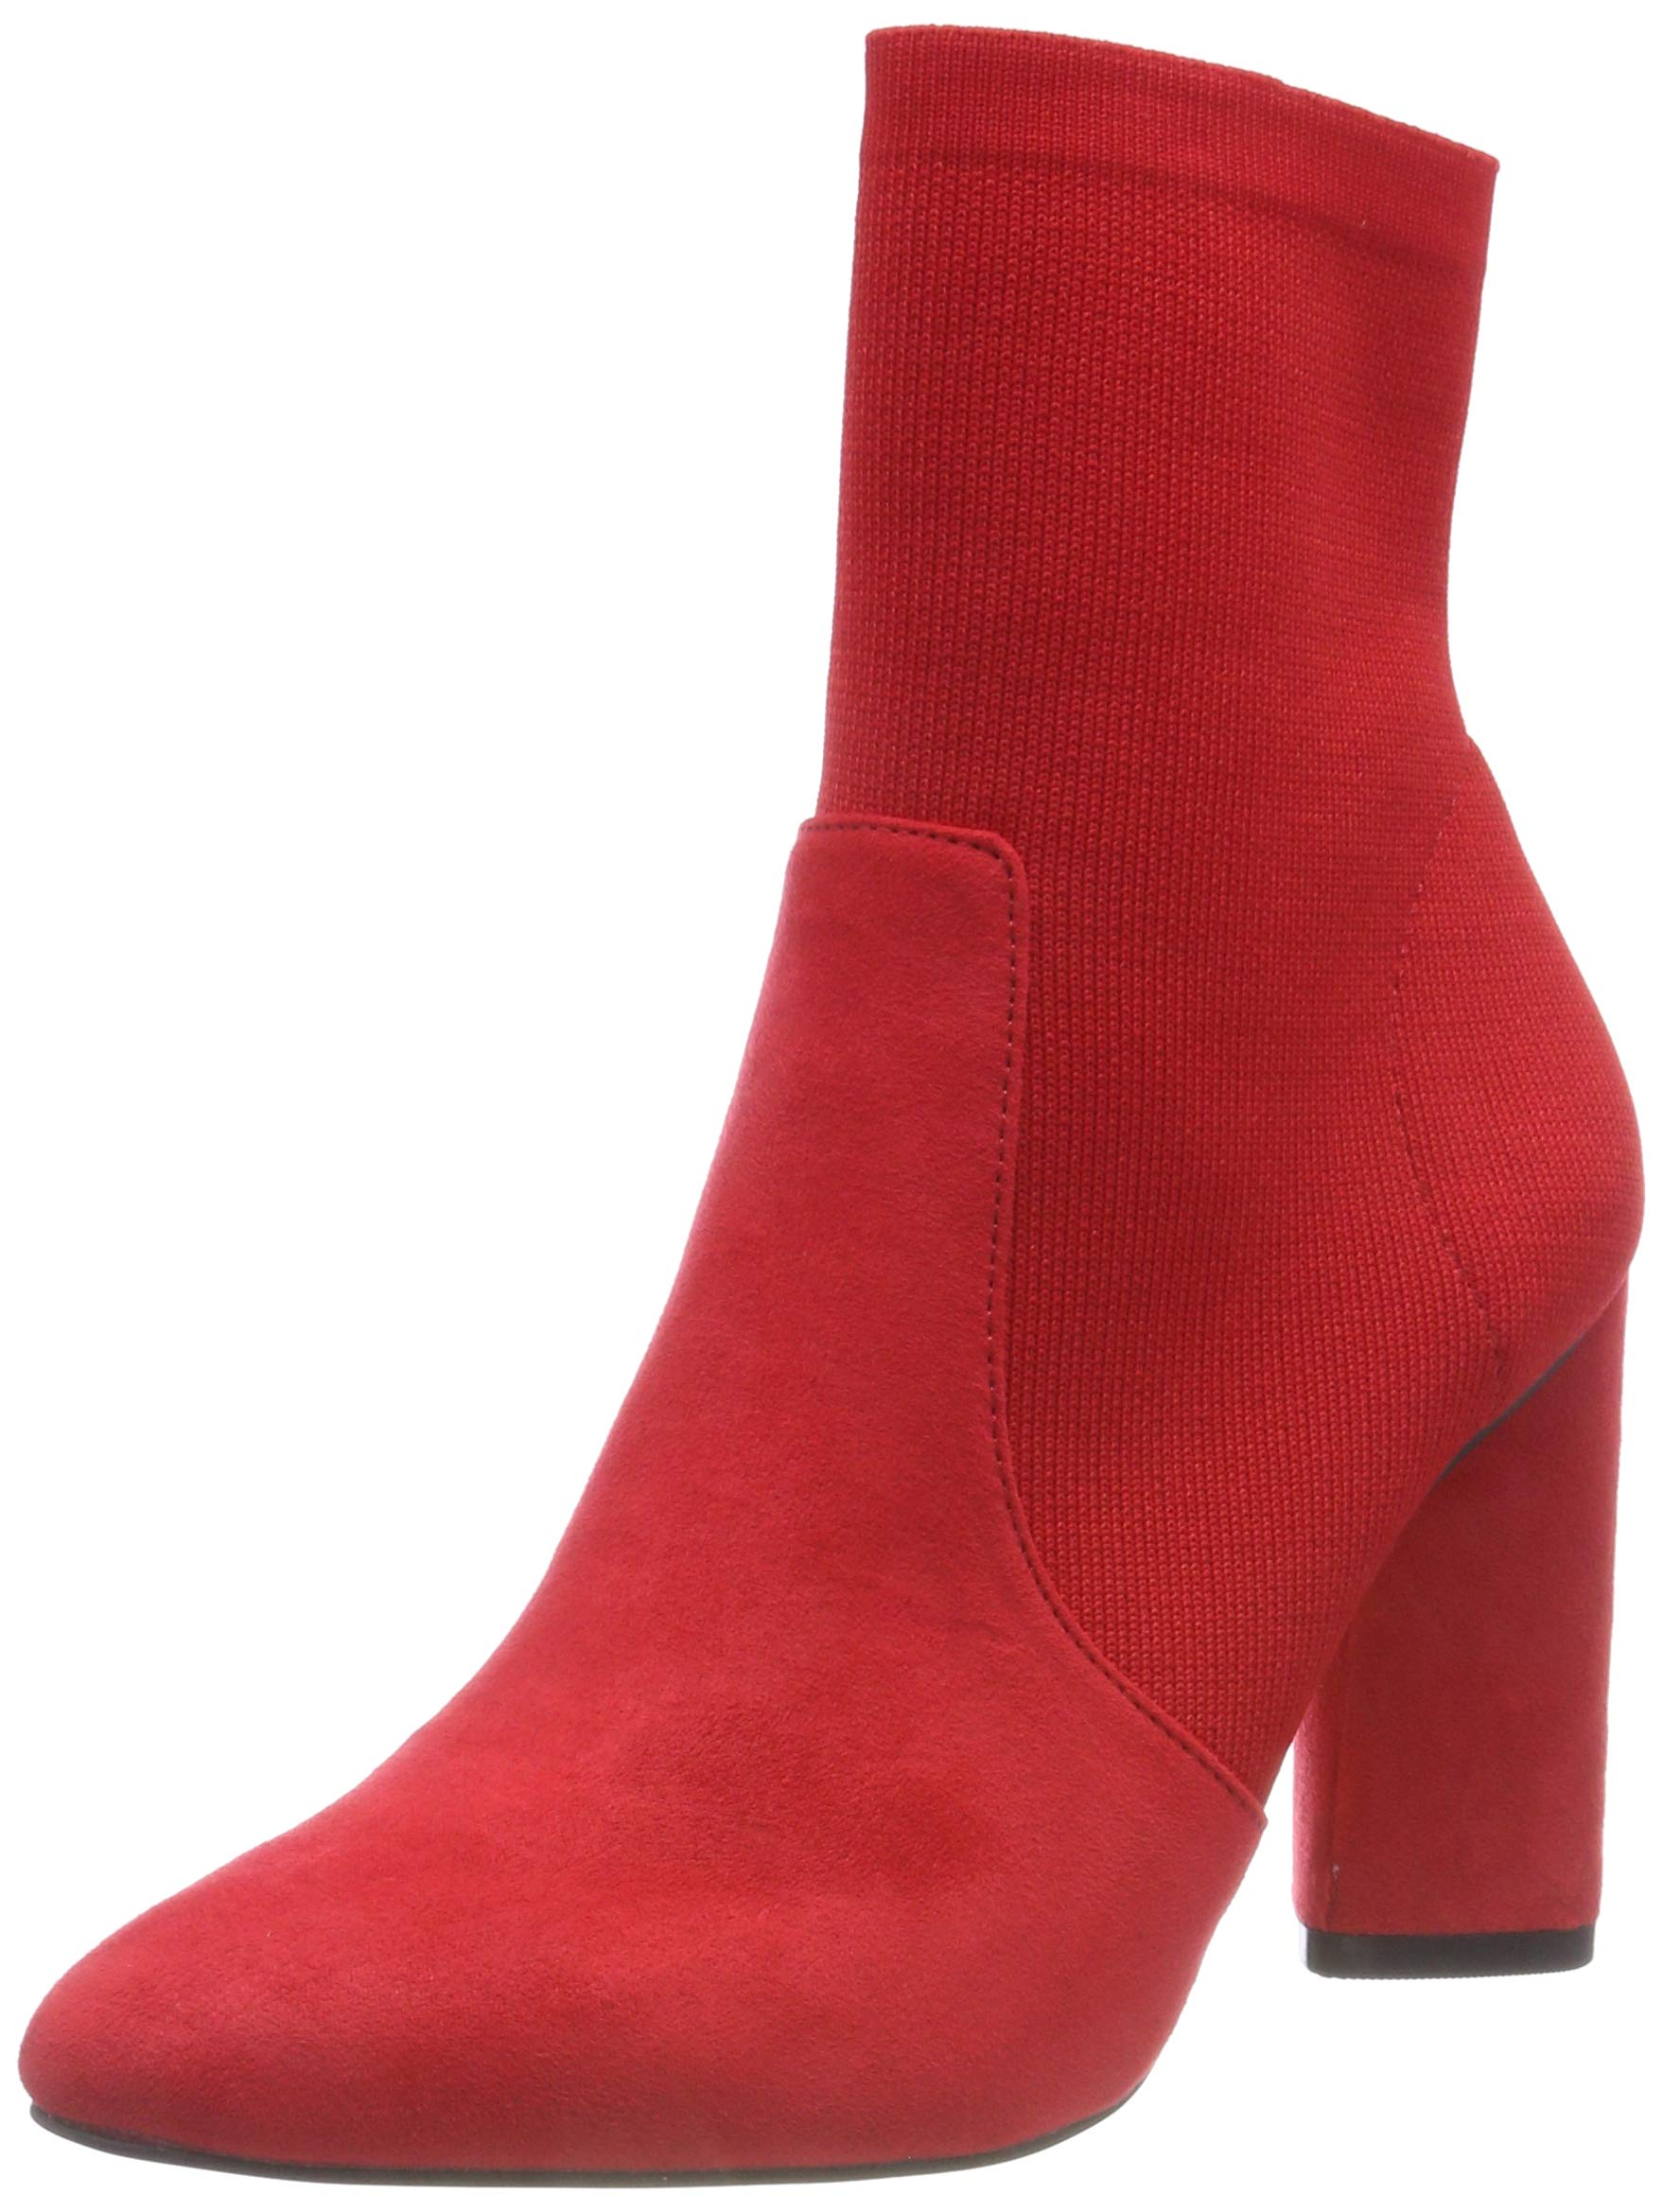 44439 Knit Sock FemmeRougered Bianco BootBottines Eu shBdtrxQC